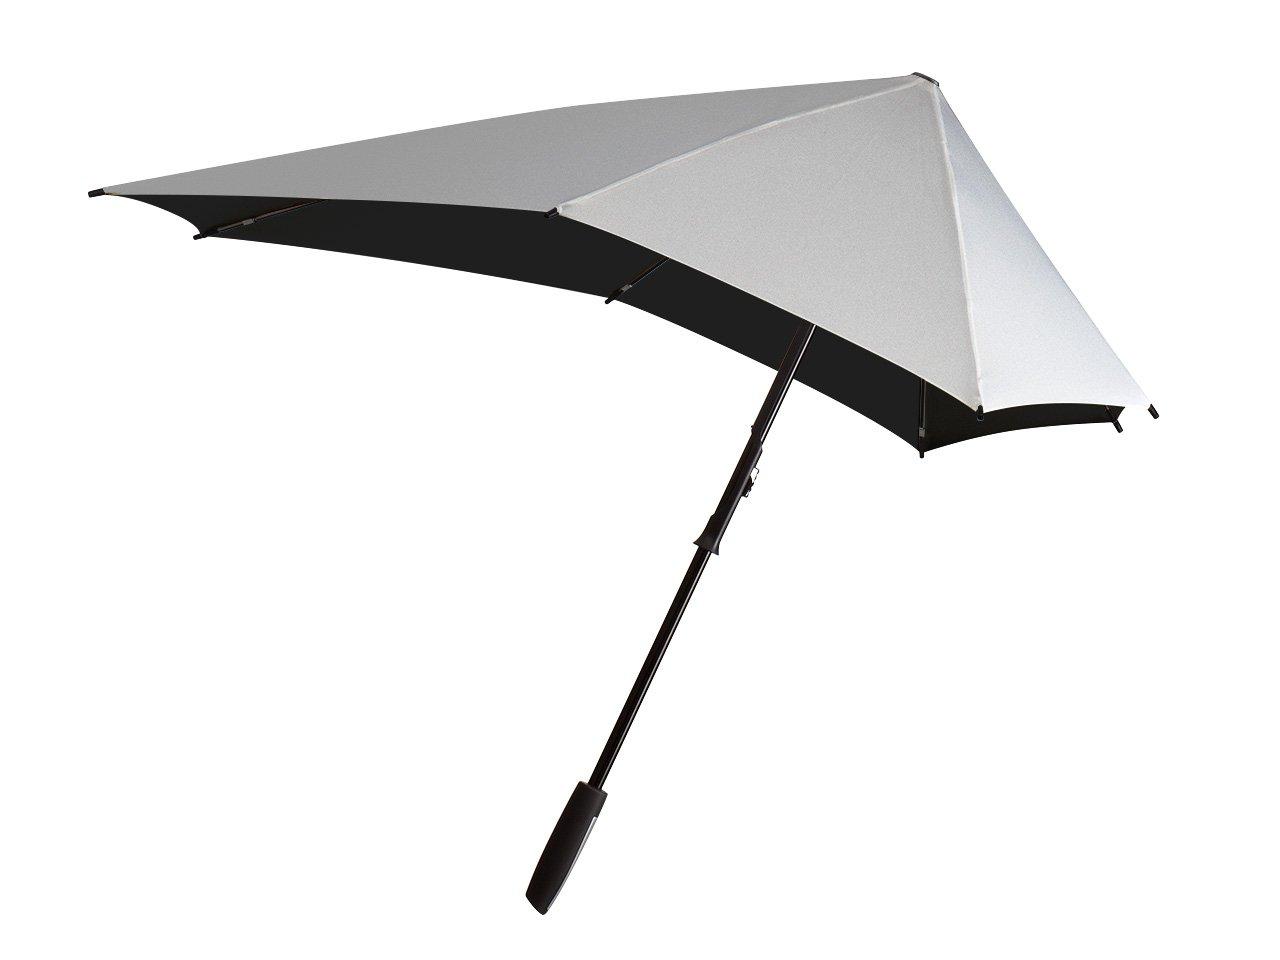 Senz Smart Umbrella XL, Shiny Silver by senz